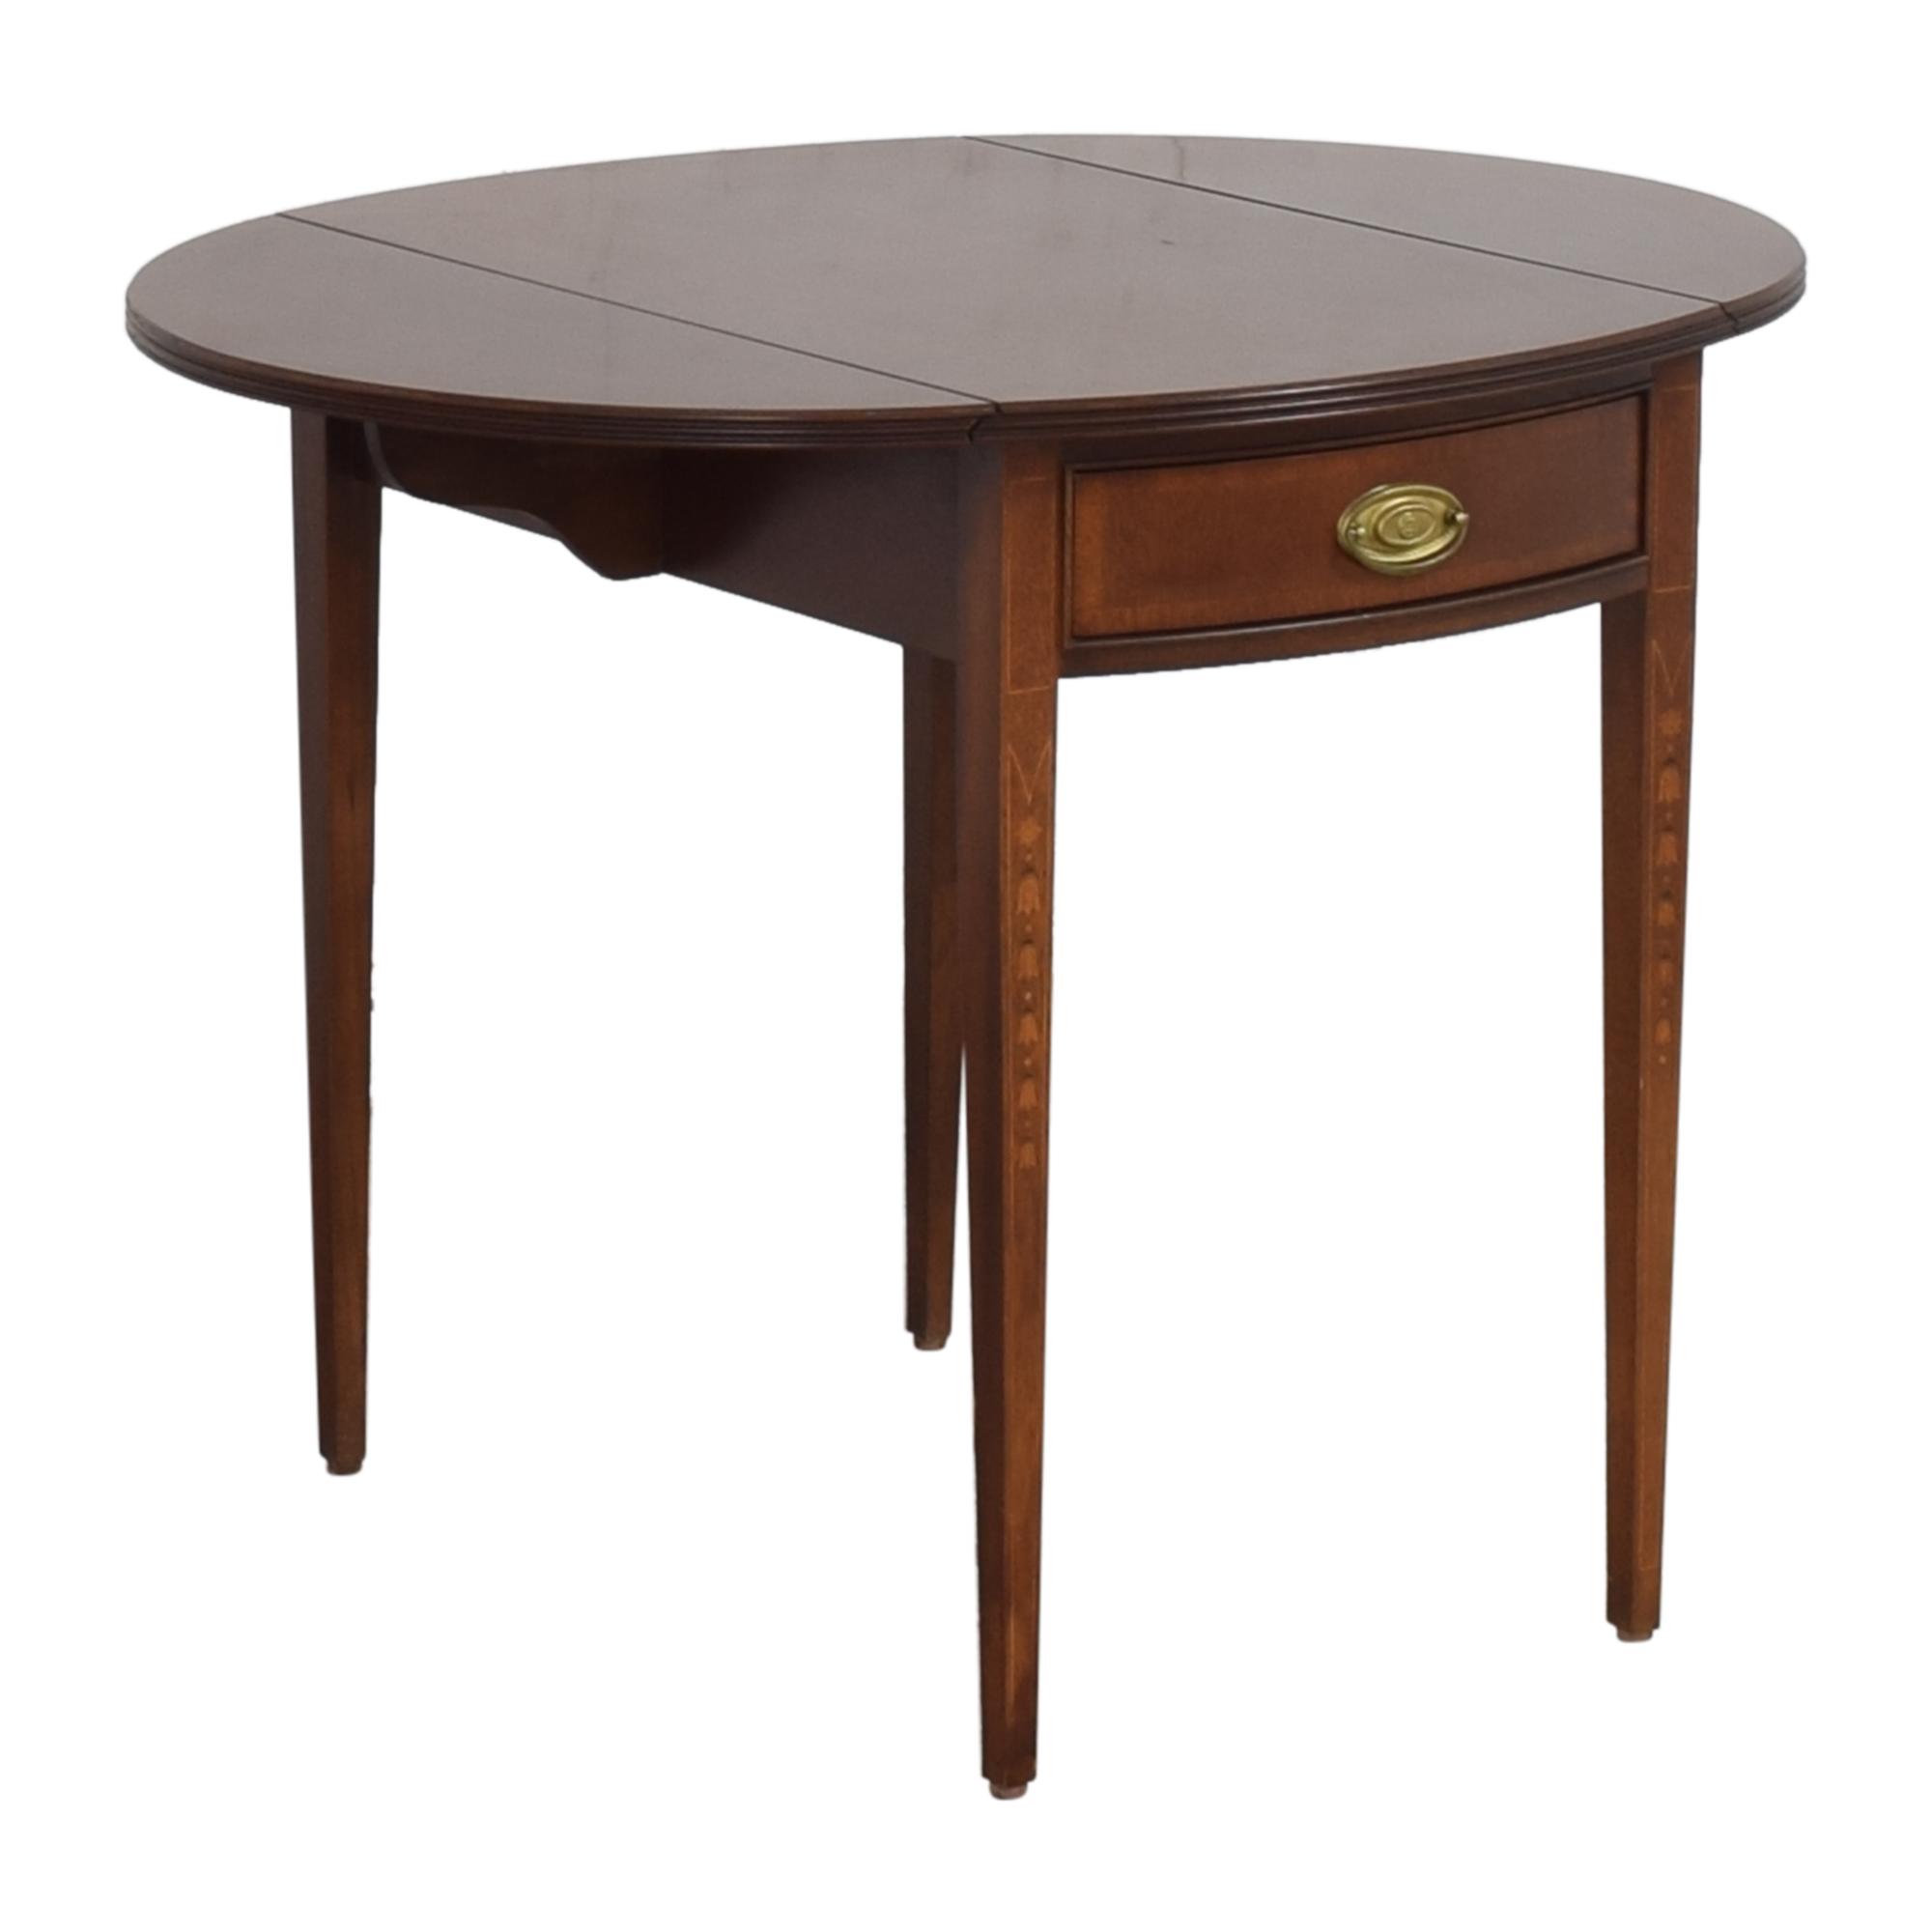 Ethan Allen Ethan Allen 18th Century Collection Pembroke End Table nyc